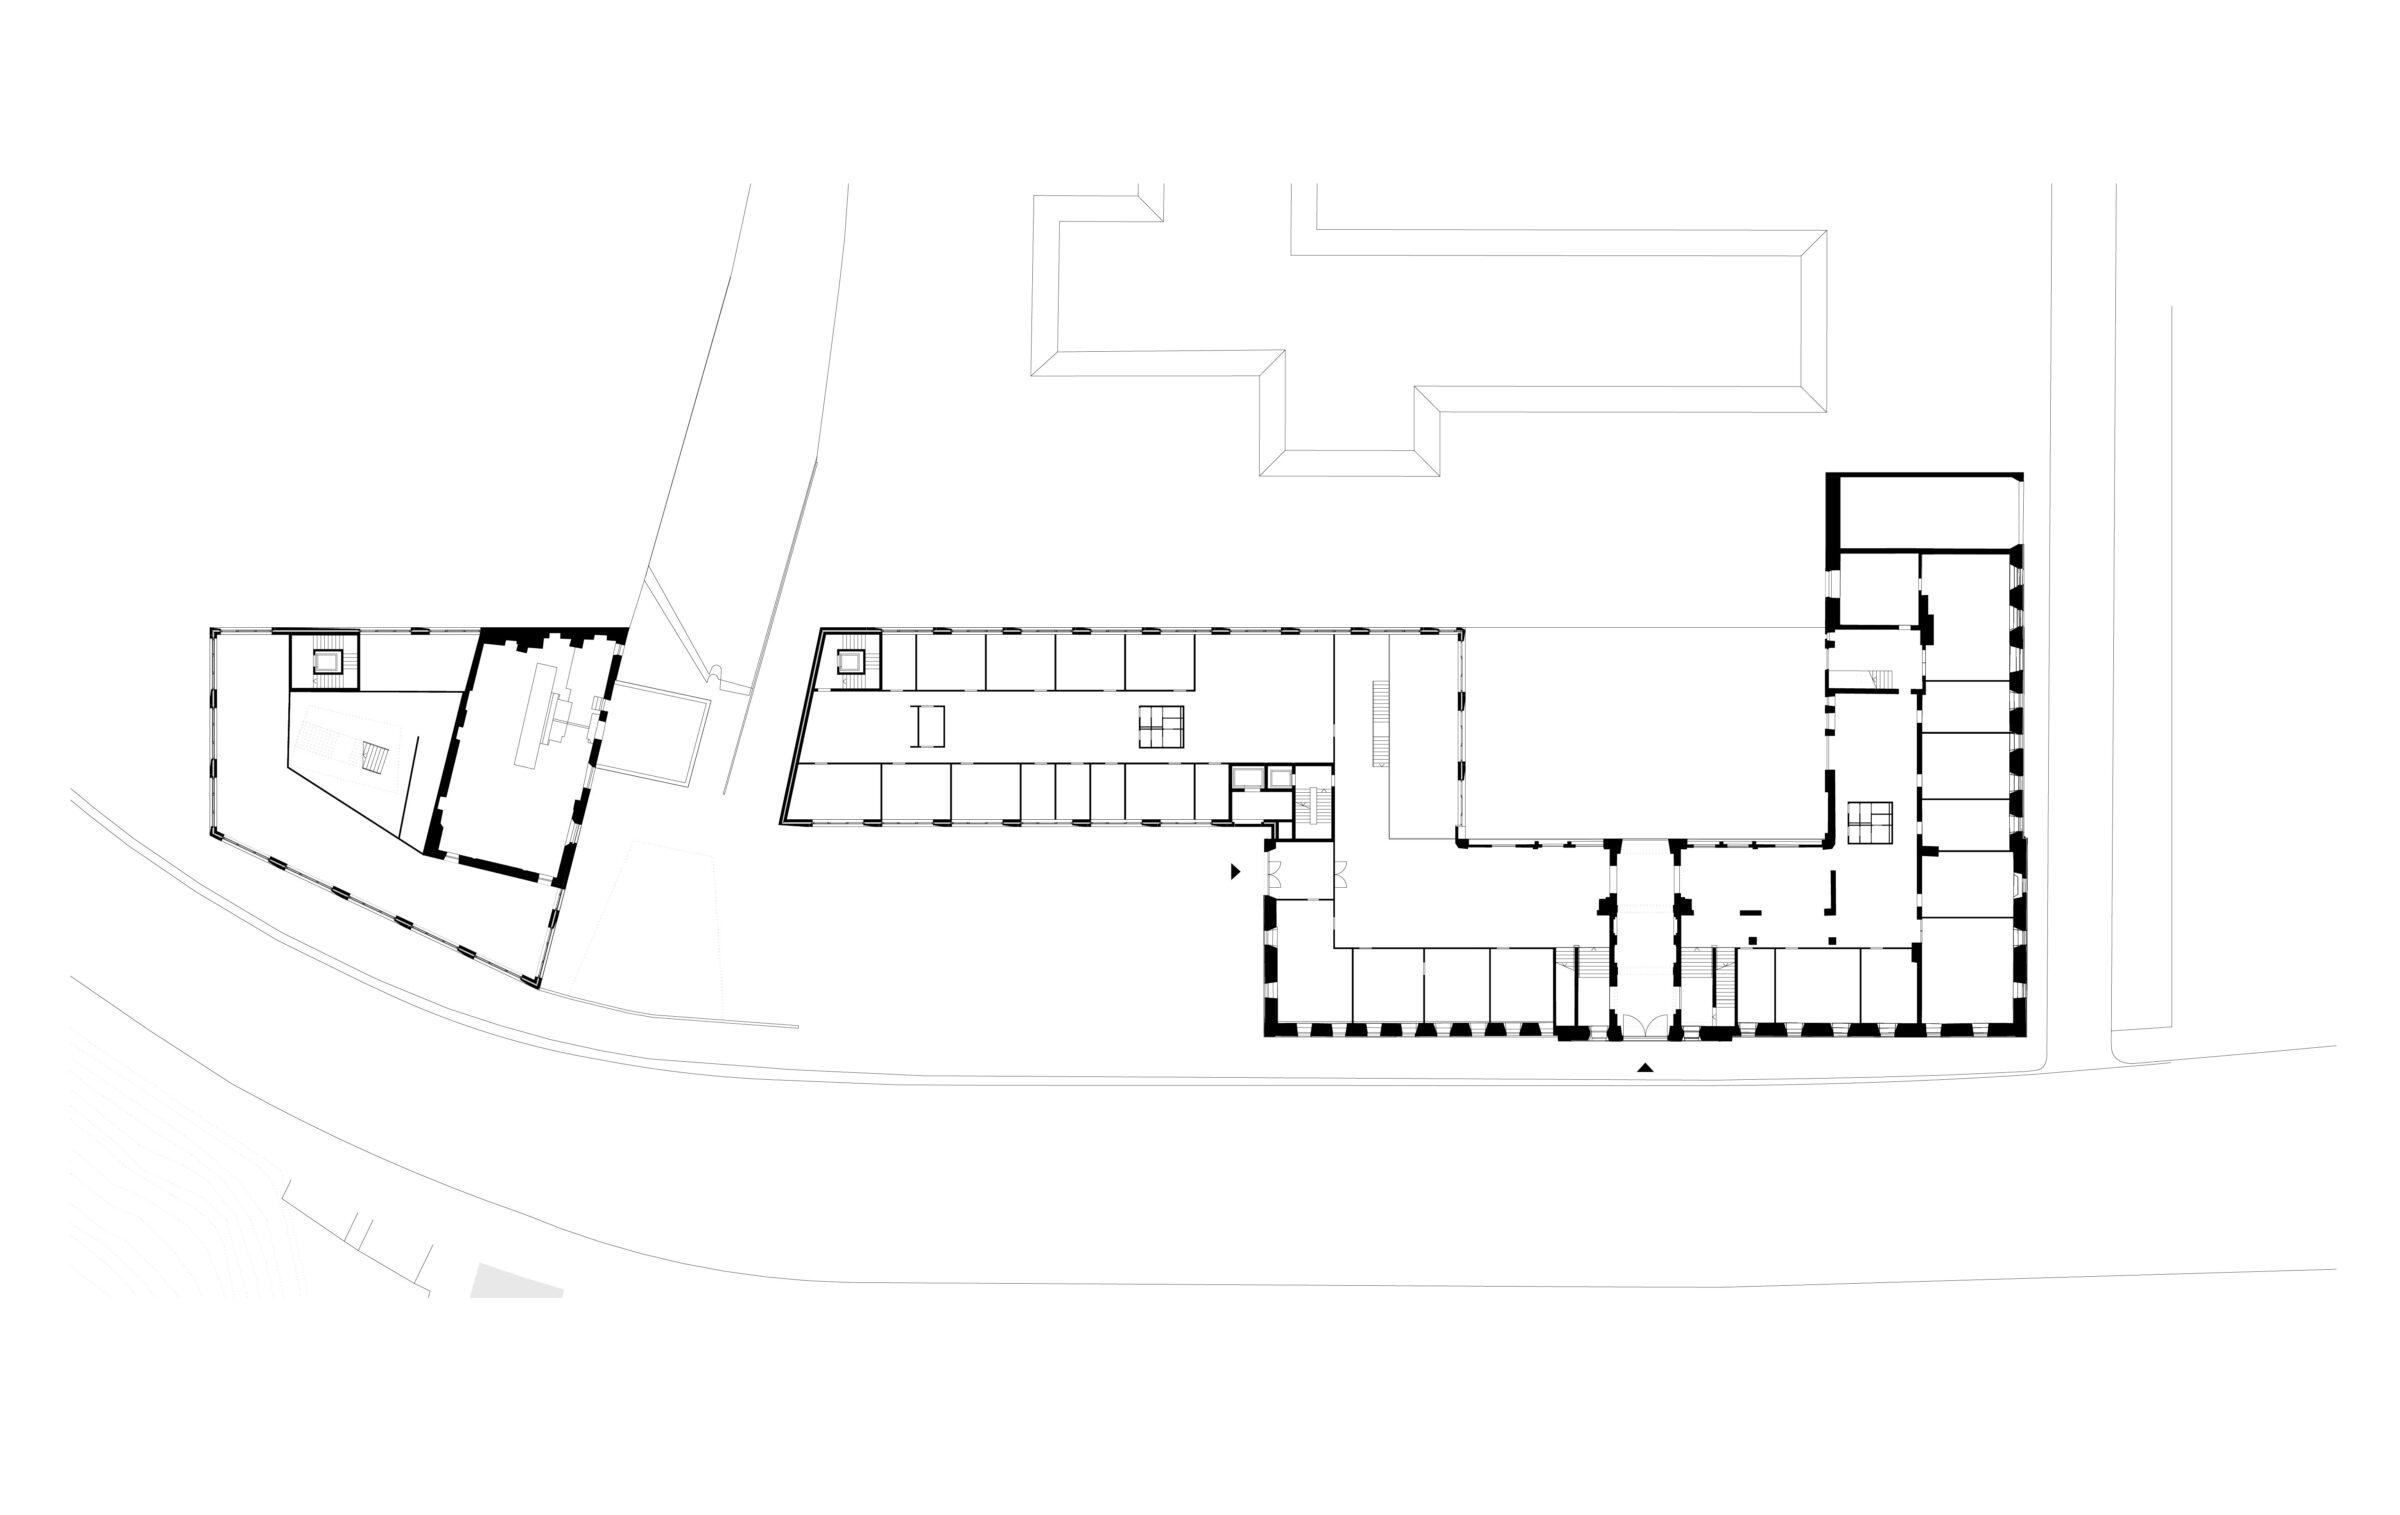 Paulaner Verwaltungsbau dreisterneplus Meili Peter Bürogebäude